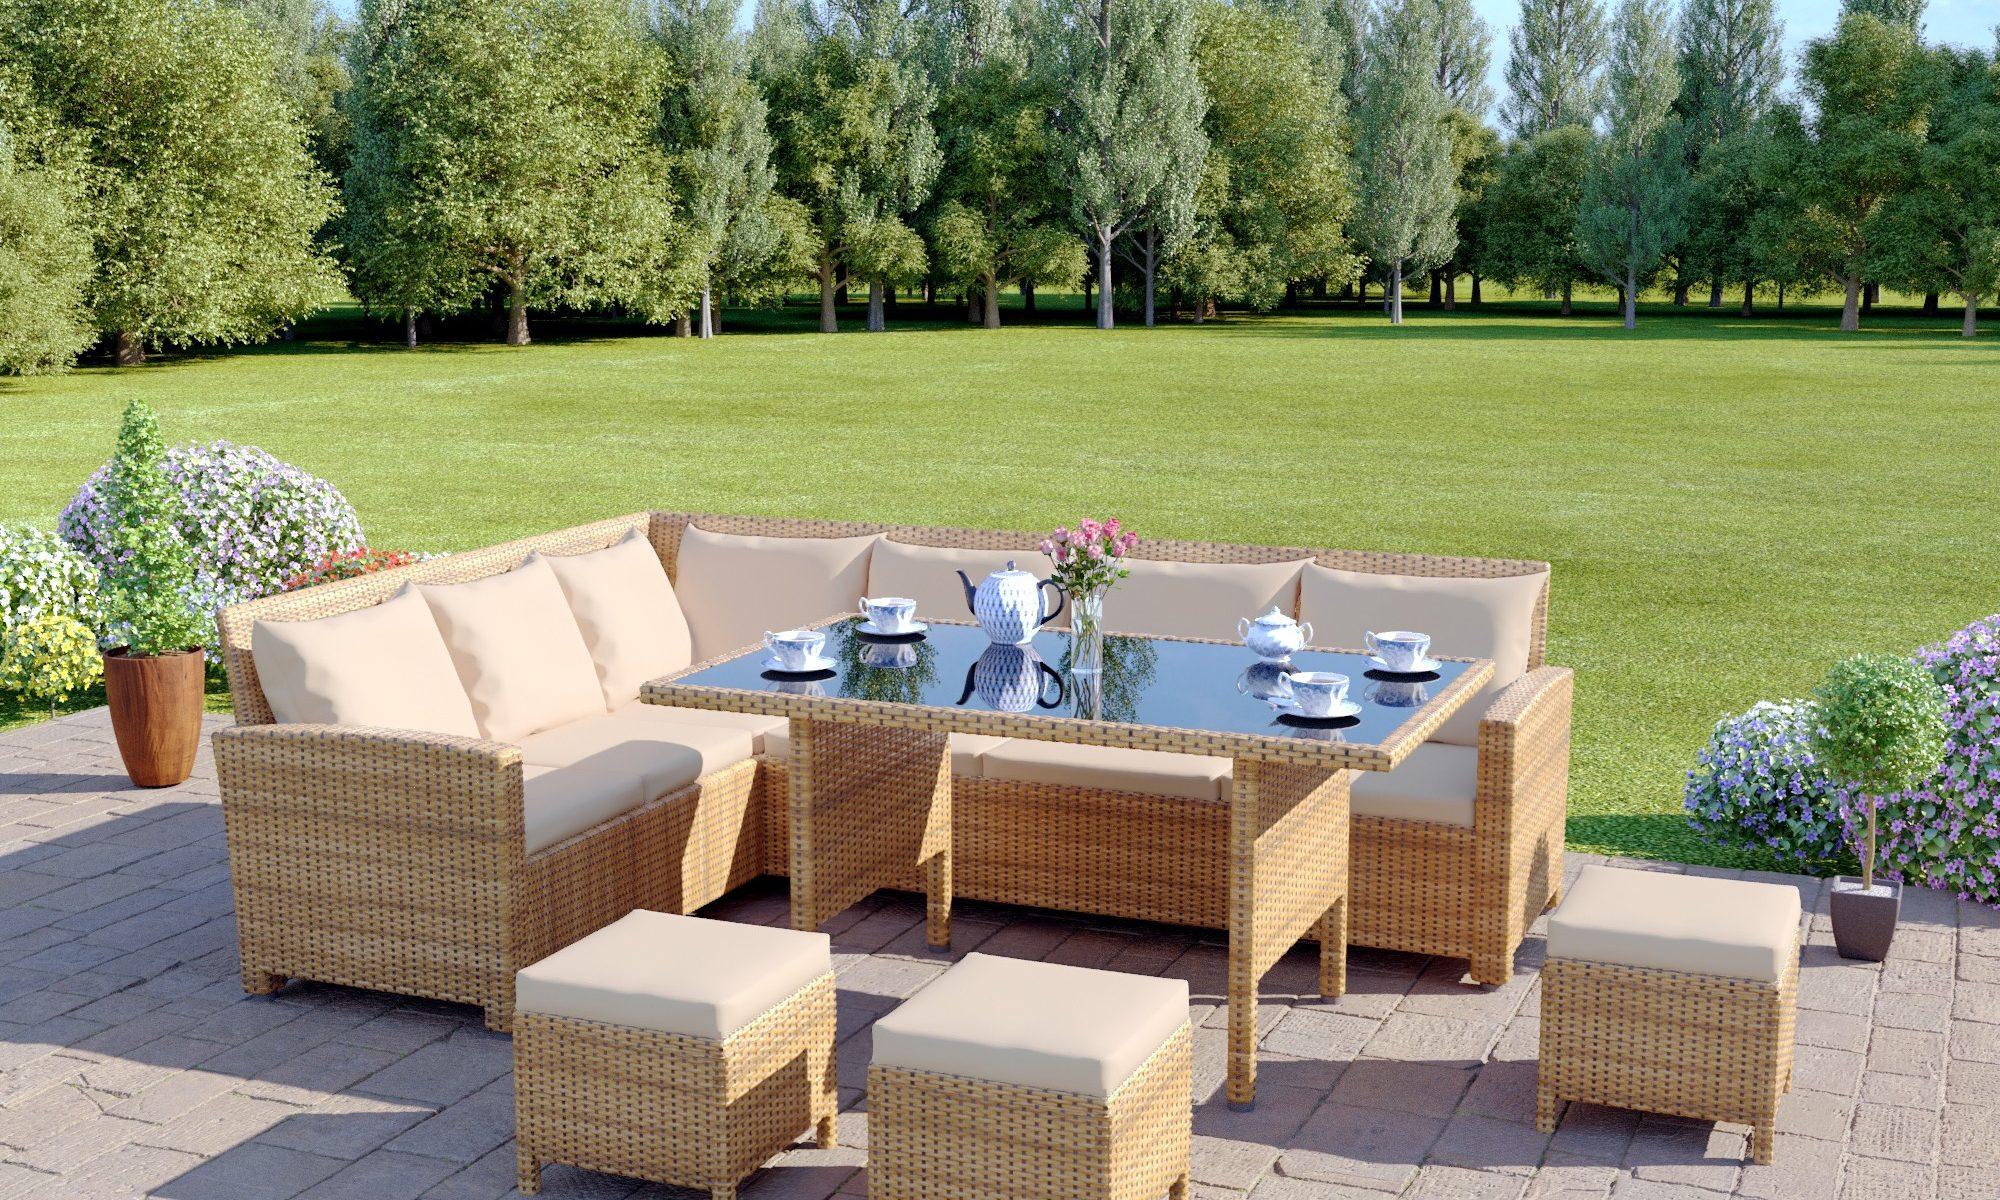 9 Seat Light Brown Rattan Garden Furniture Corner Sofa Dining Set in rattan furniture